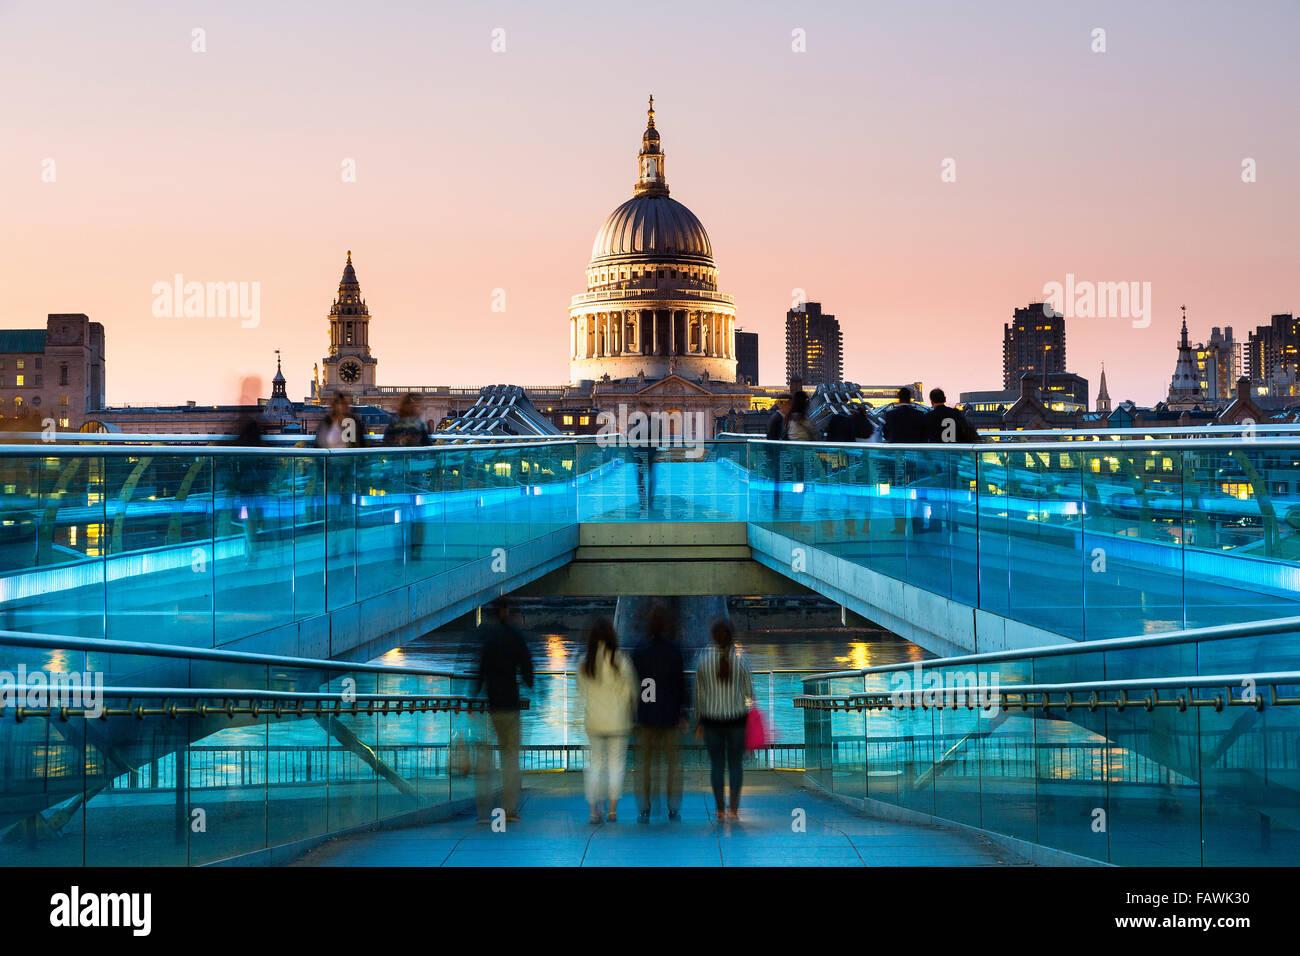 London, Millennium bridge at dusk - Stock Image